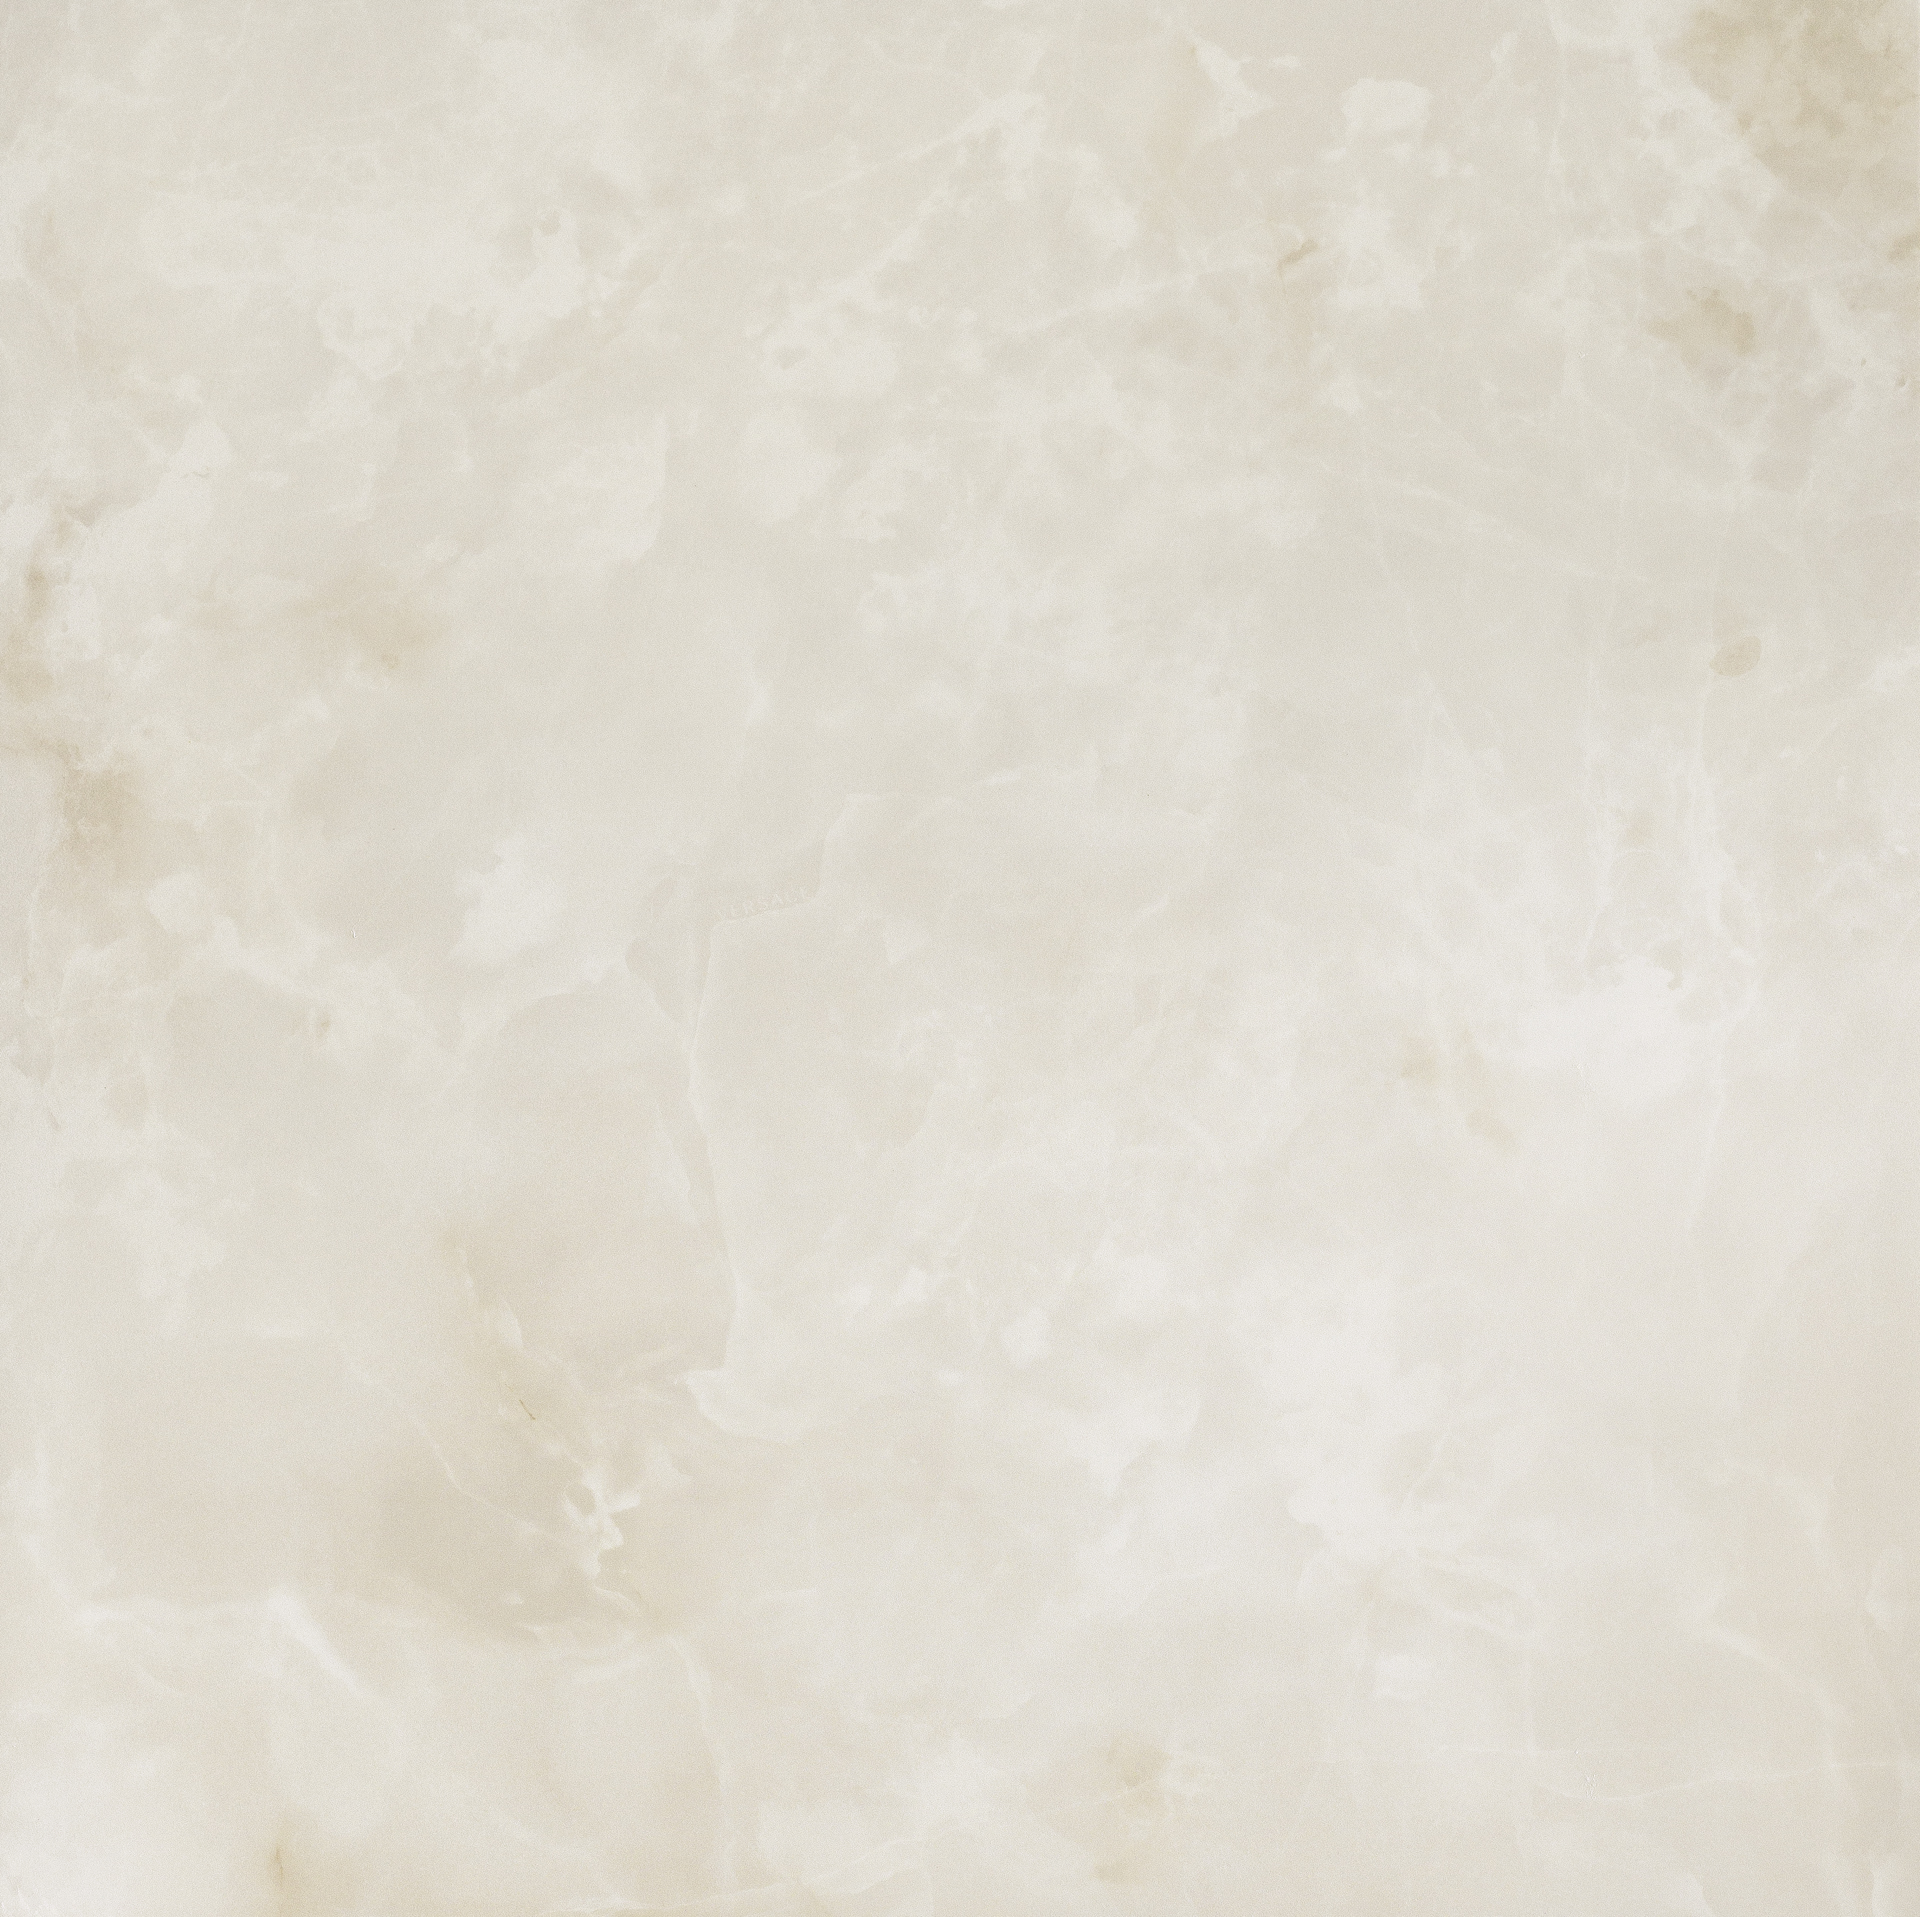 Купить Керамогранит Versace Emote 262500 Onice Bianco fondo Rett 78х78, Италия